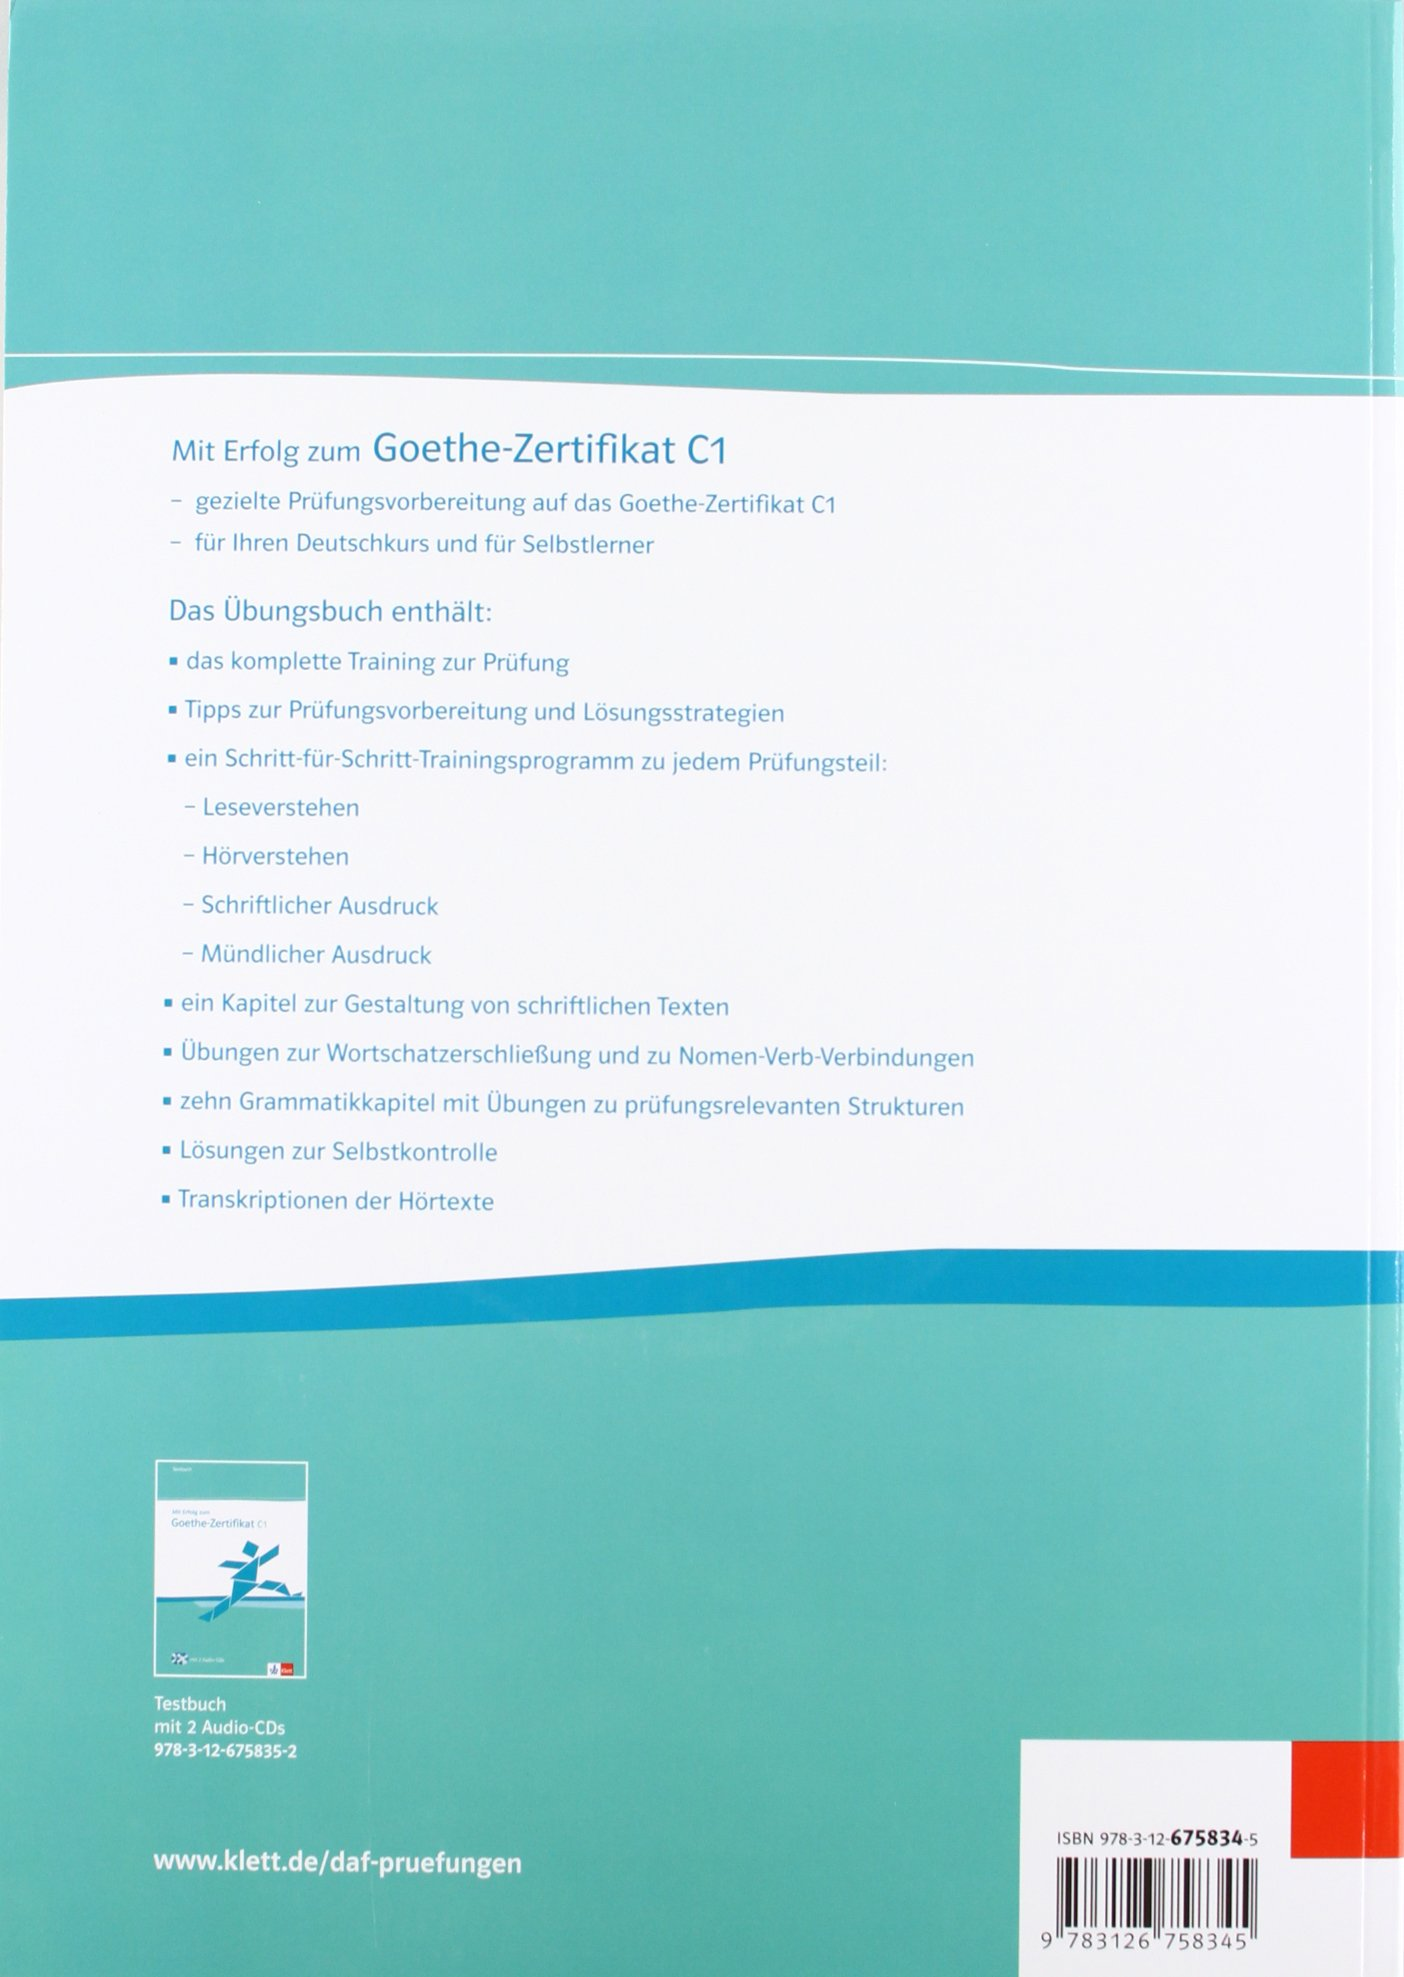 Mit Erfolg Zum Goethe Zertifikat C1 übungsbuch Audio Cd Amazon